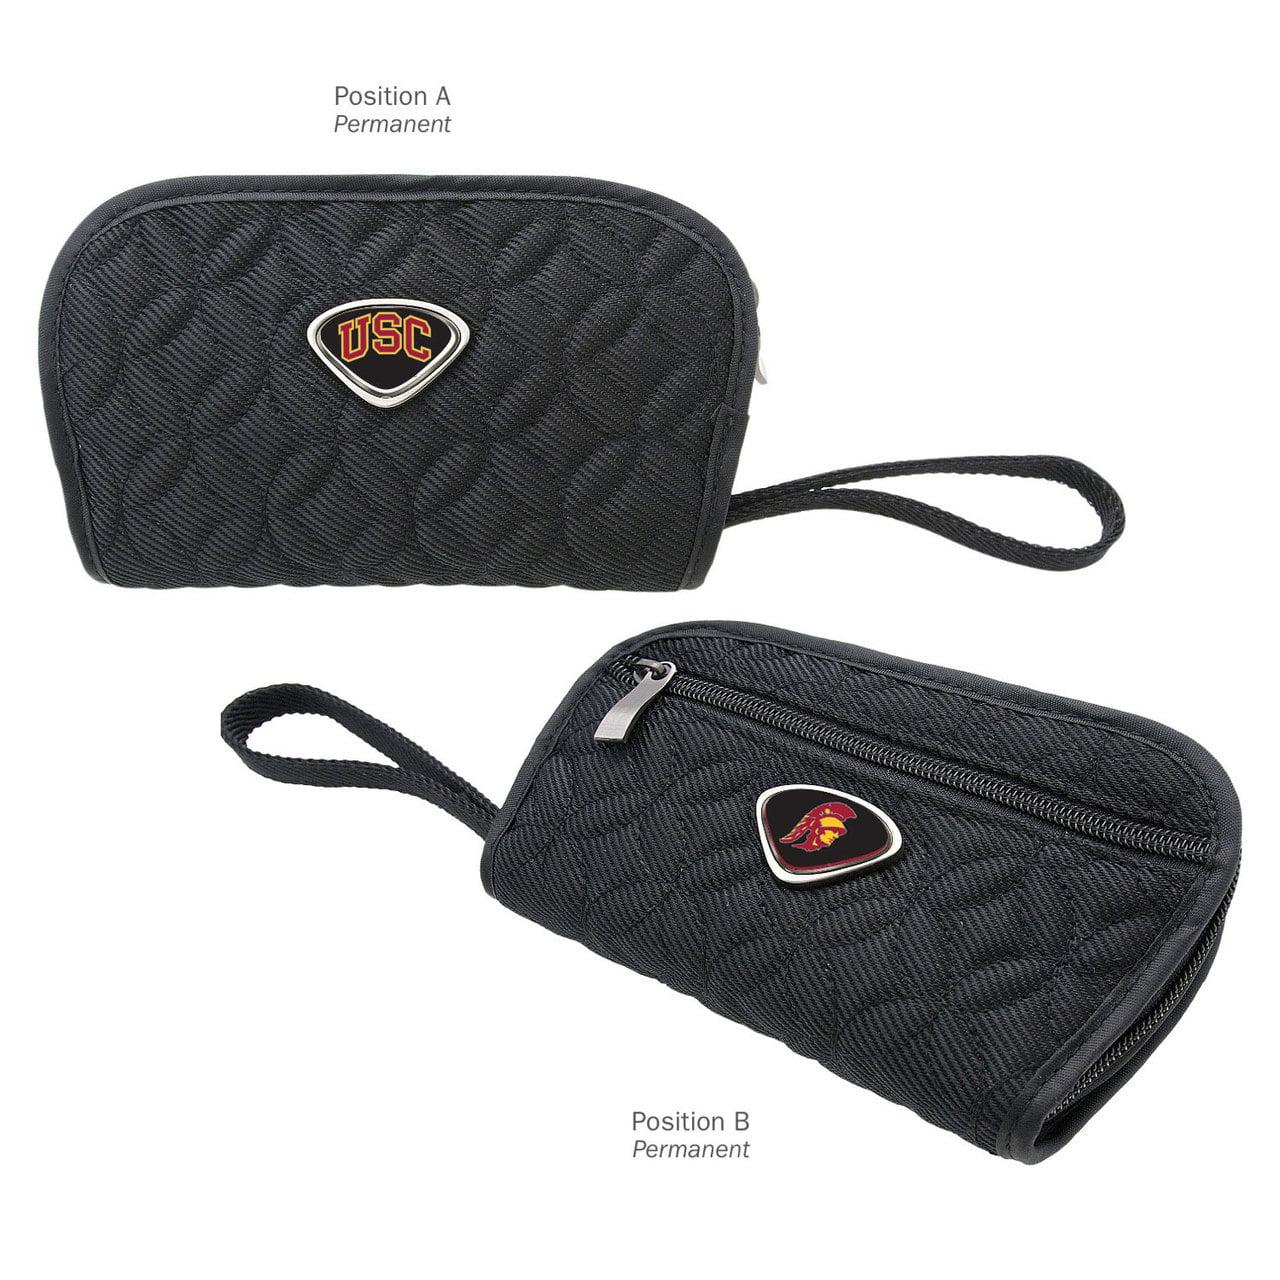 USC Trojans  Women's Travel Wallet USC INITIALS/USC MASCOT TROJANS